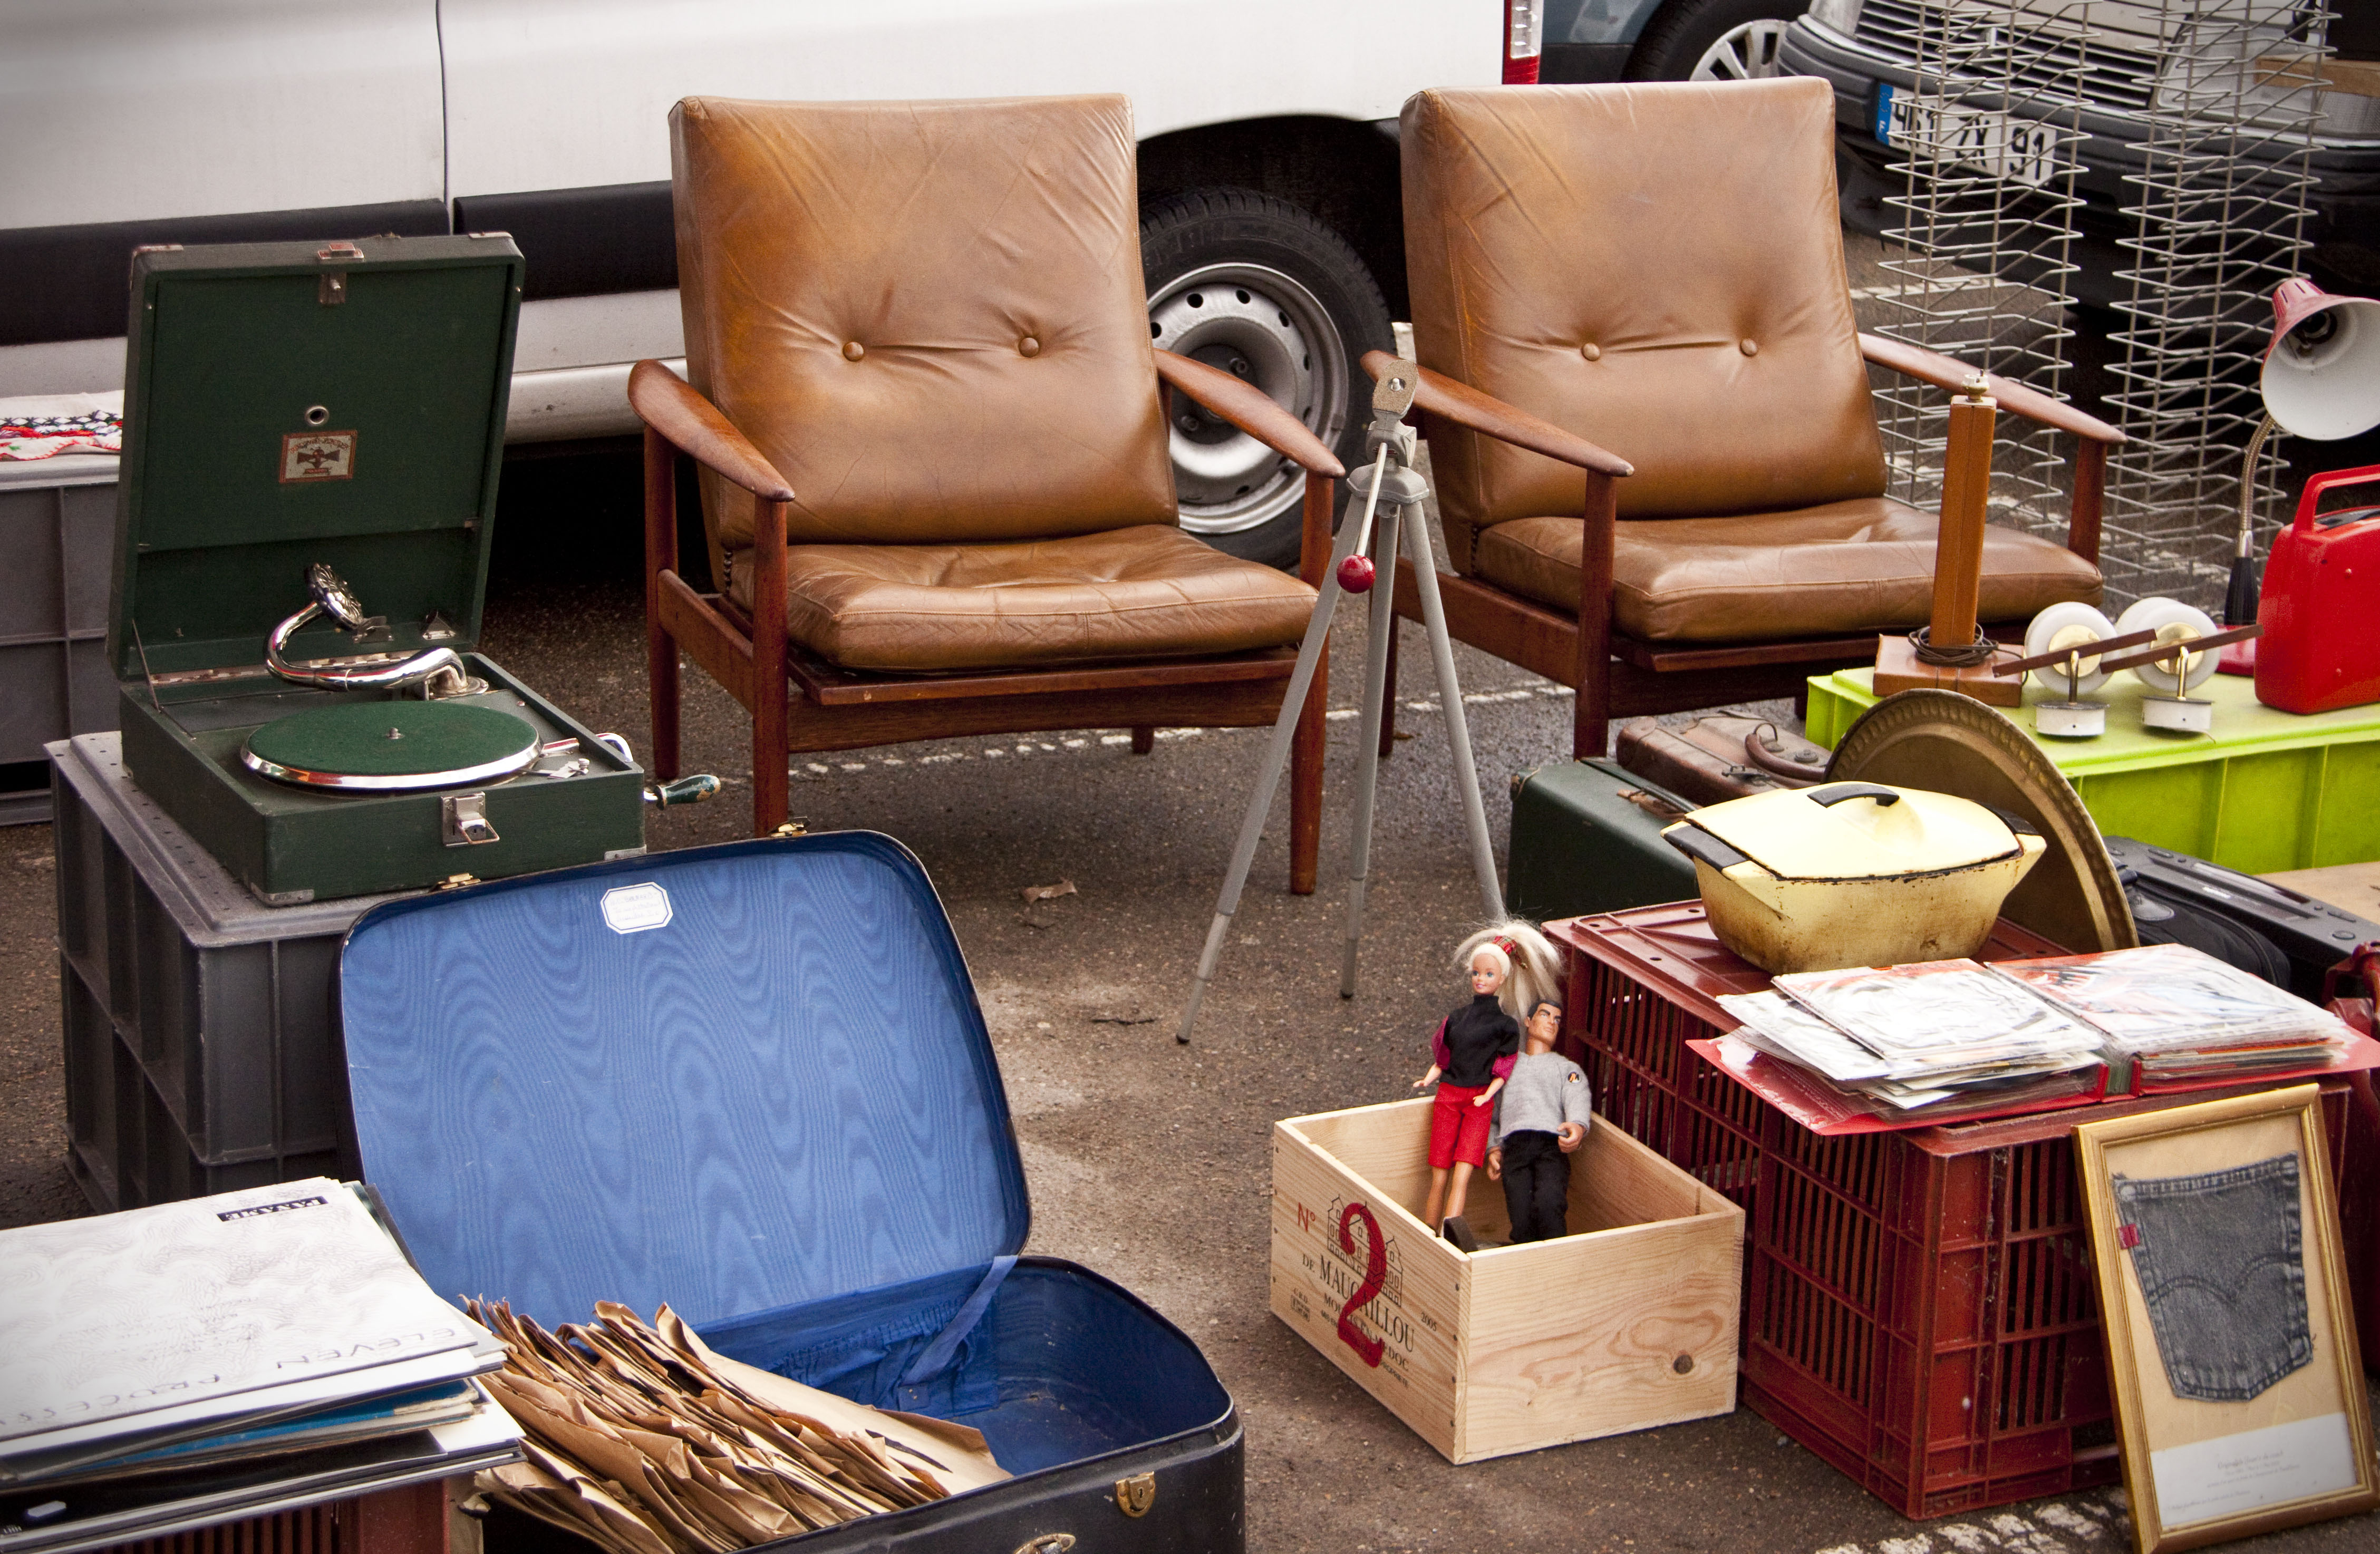 vide grenier paris 29 mai 2011. Black Bedroom Furniture Sets. Home Design Ideas